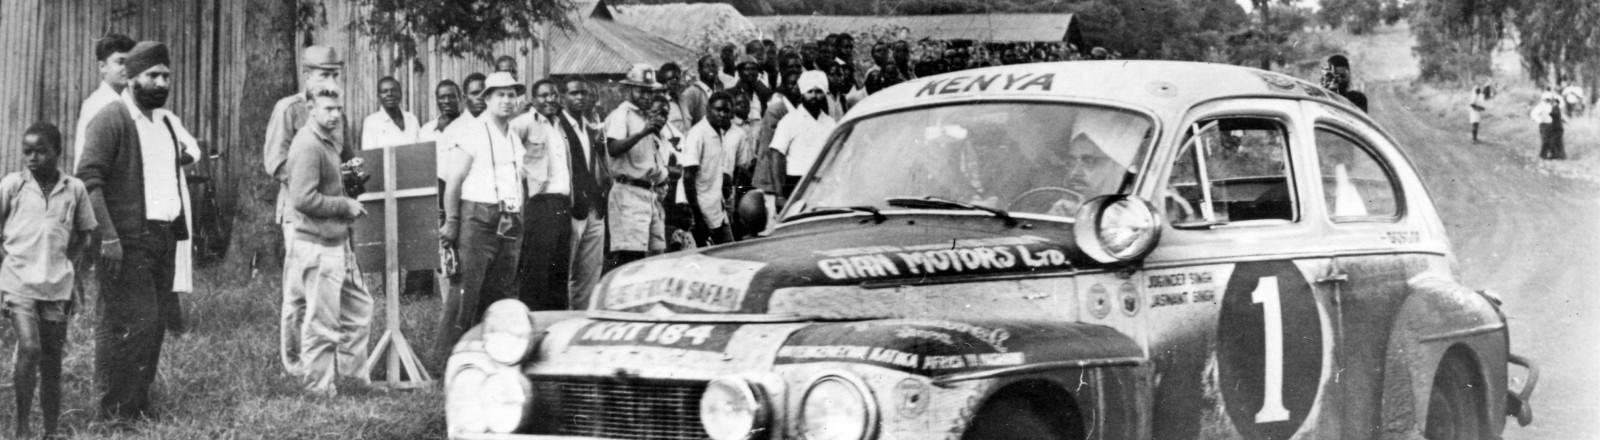 Volvo Katterug wint Safari Rally - in 1965